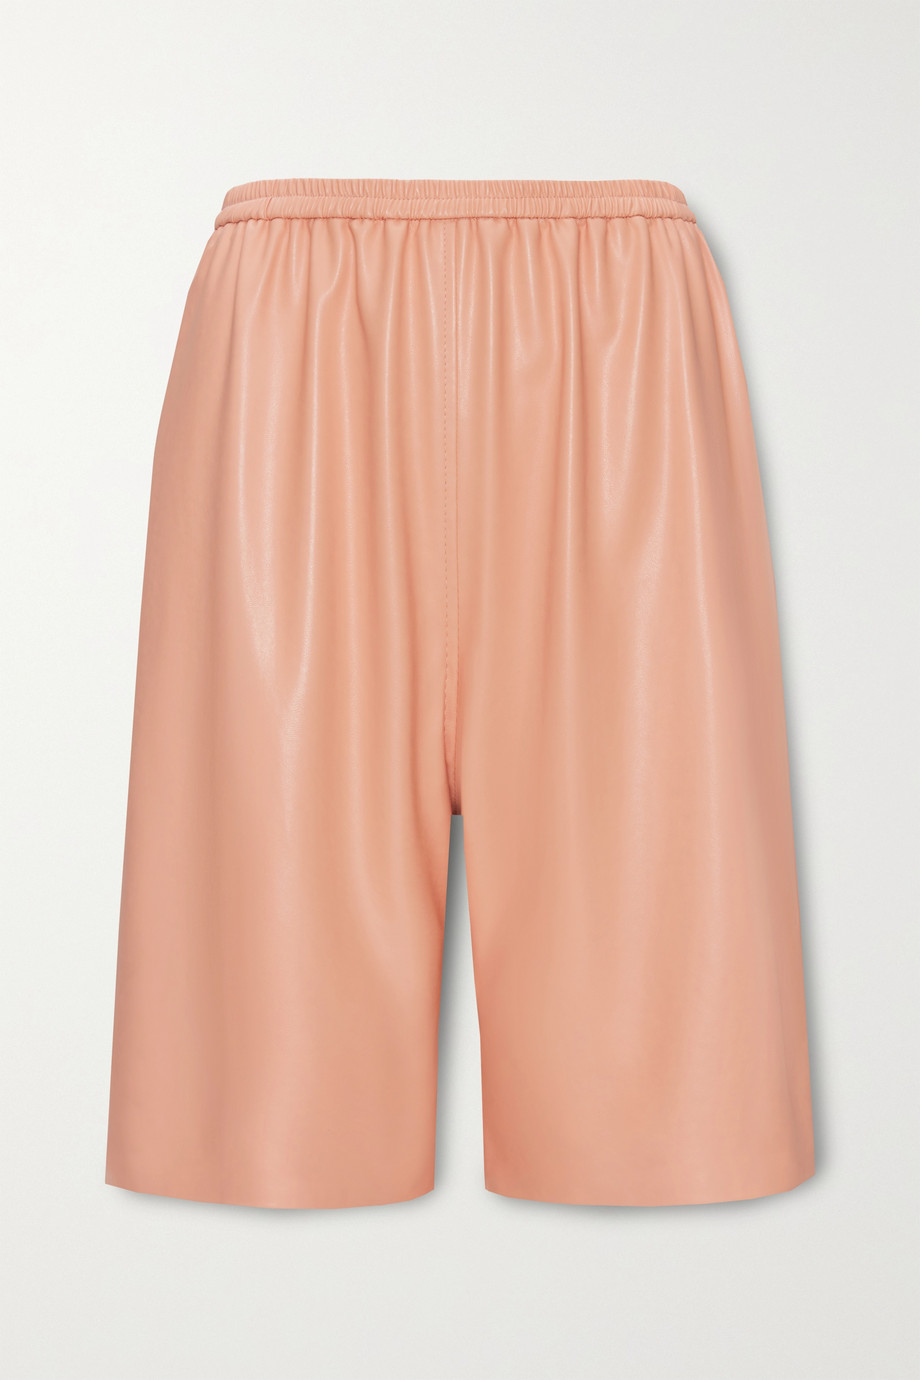 LAPOINTE Shorts aus Kunstleder